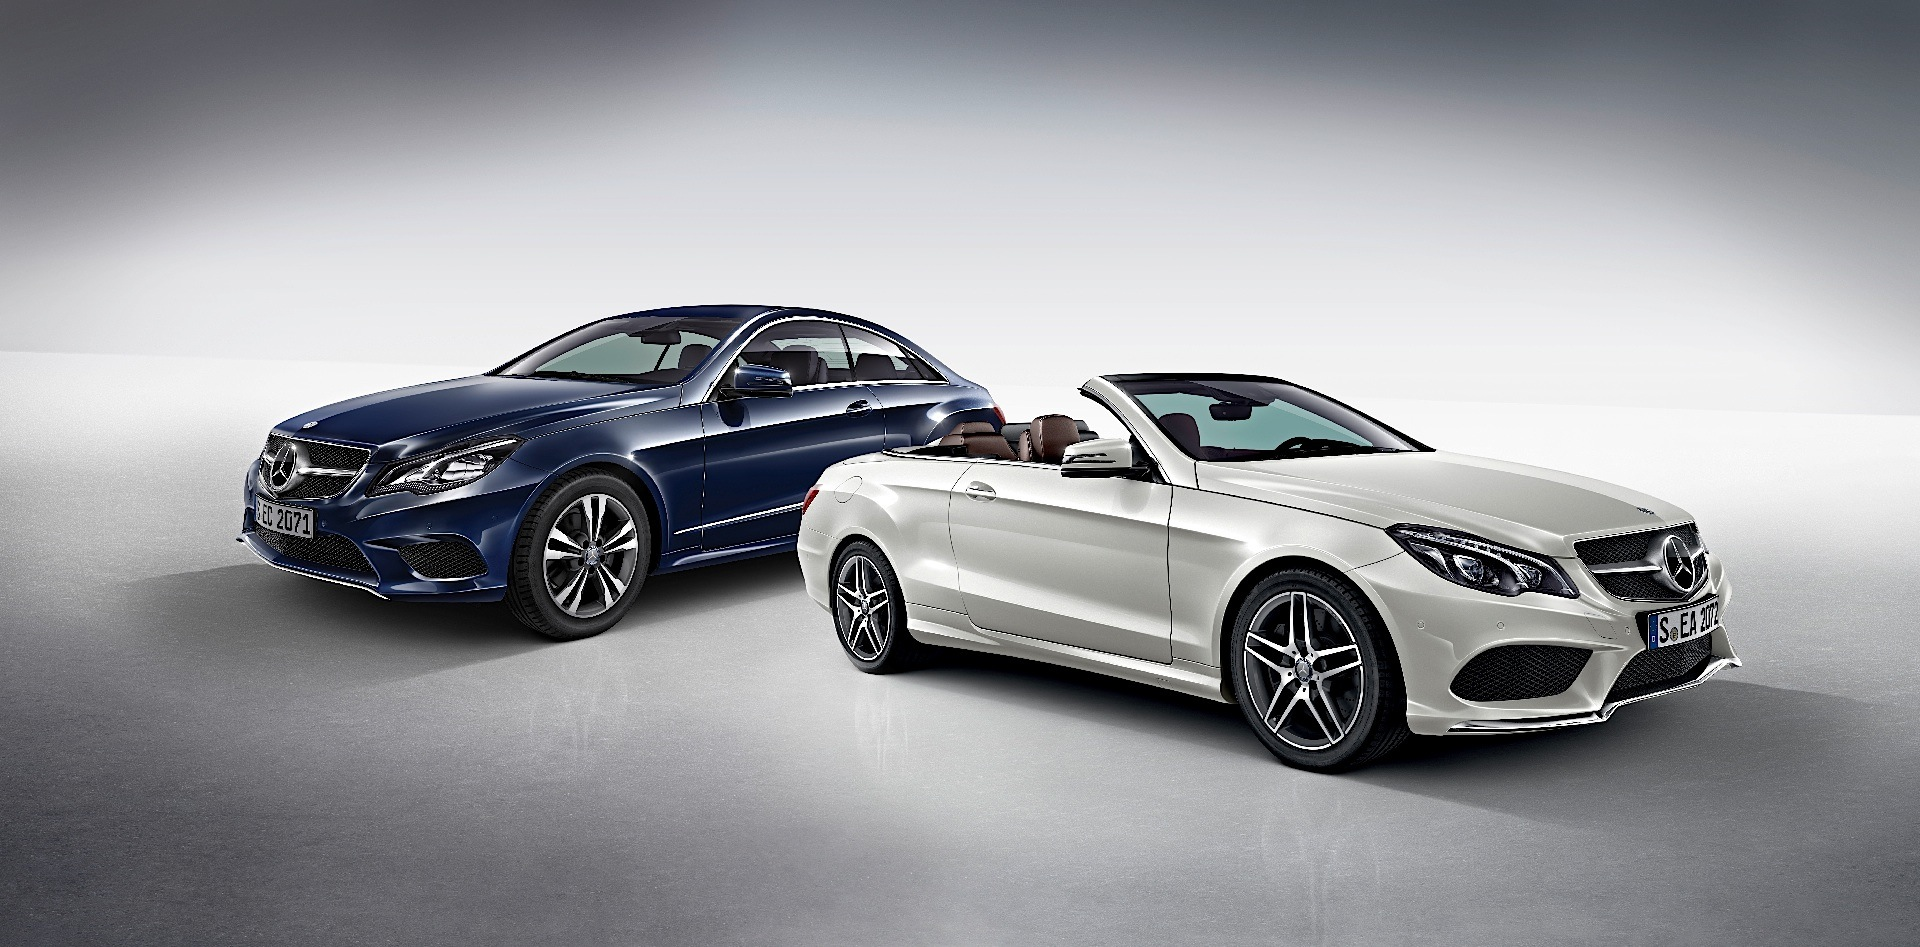 Mercedes benz e klasse coupe c207 2013 2014 2015 for Mercedes benz 350 coupe